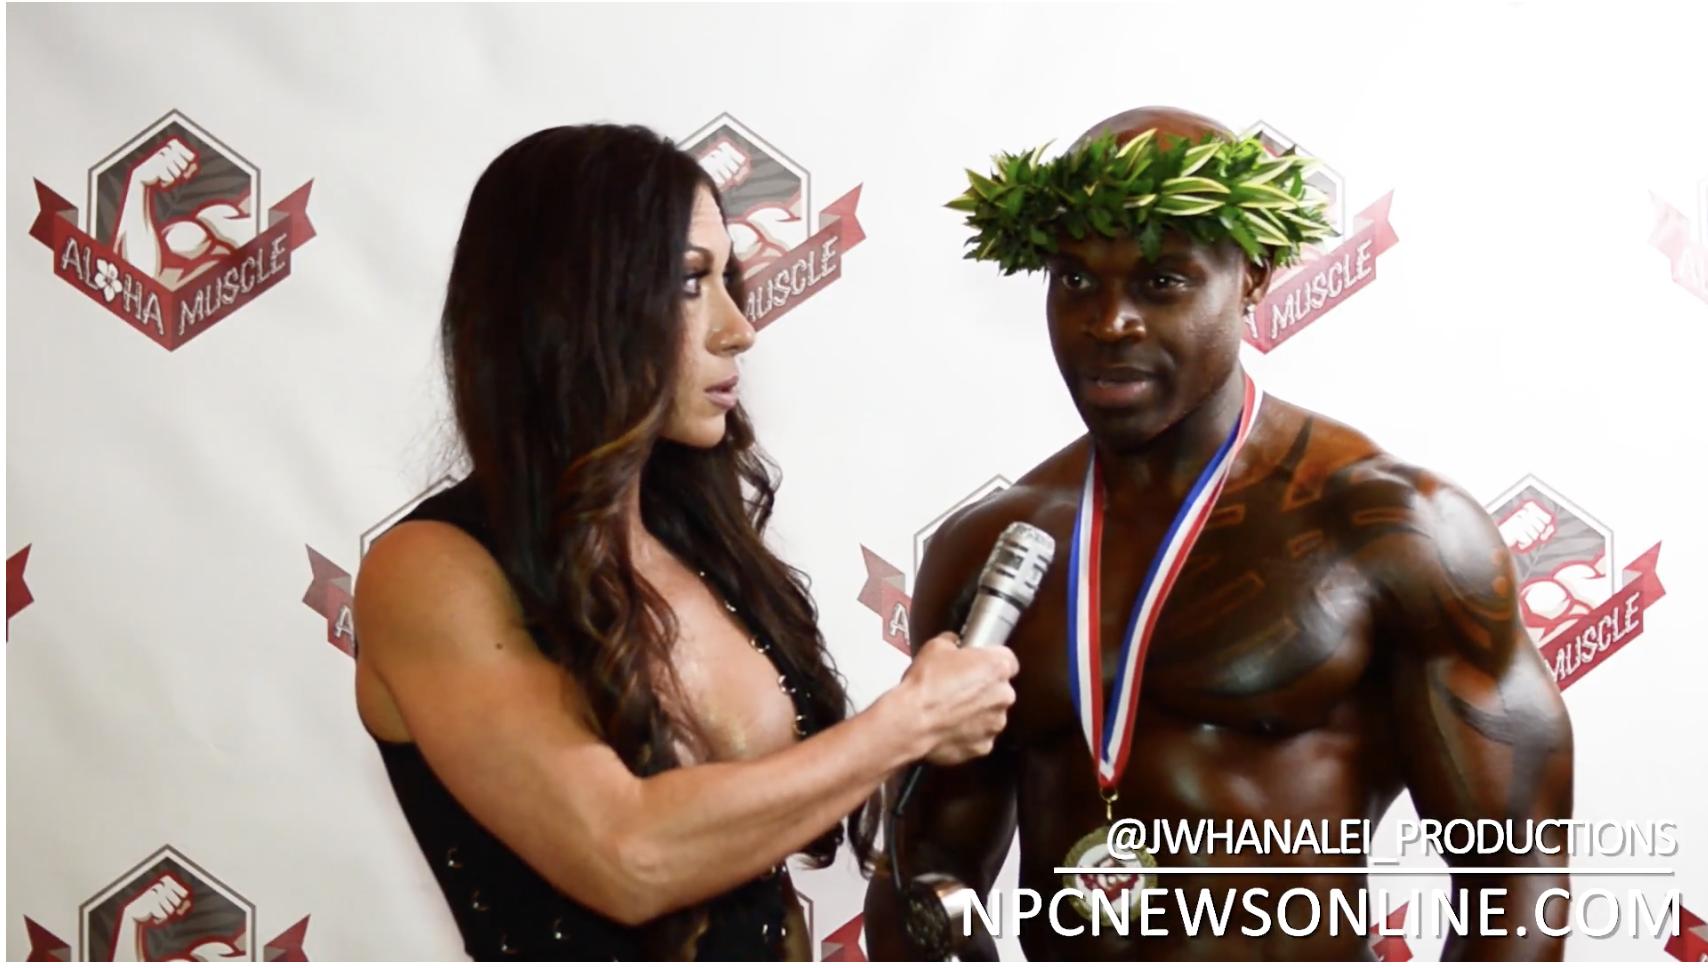 2017 NPC Aloha Muscle Masters Men's Physique Overall Winner Derrick Stevenson